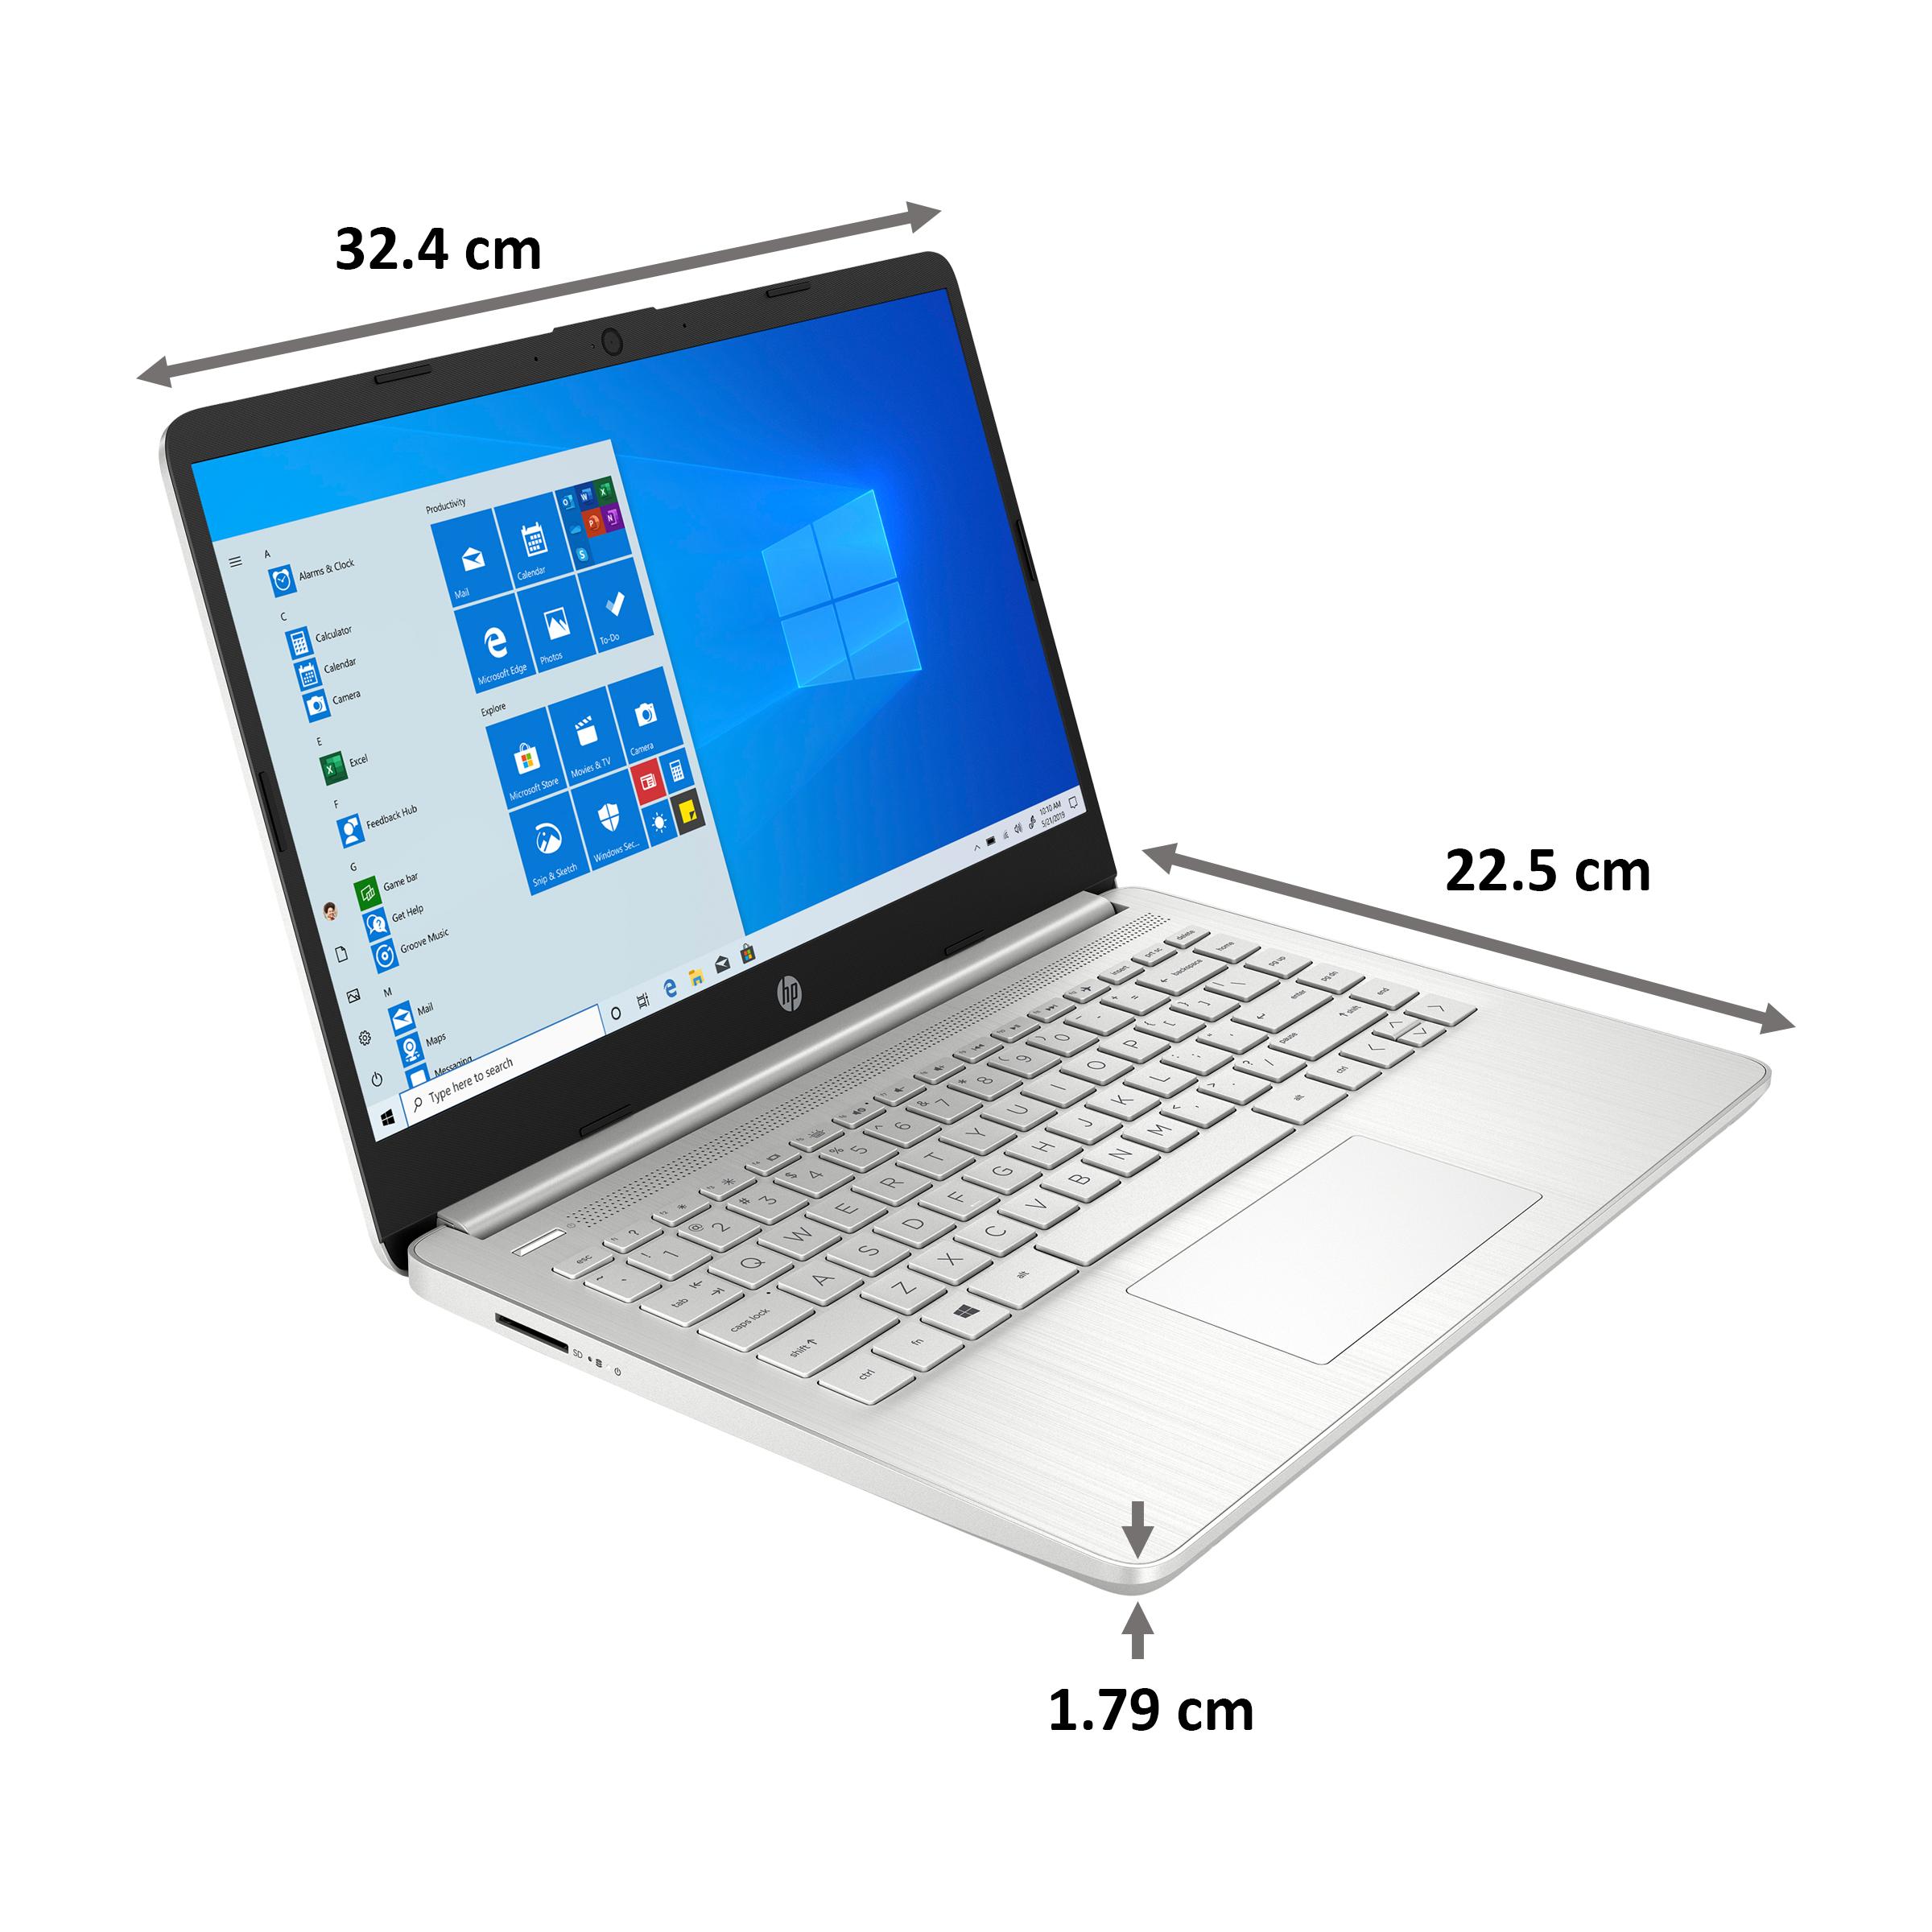 HP 14s-dq2101TU (38Z17PA#ACJ) Core i3 11th Gen Windows 10 Home Laptop (8GB RAM, 256GB SSD, Intel UHD Graphics, MS Office, 35.56cm, Natural Silver)_2